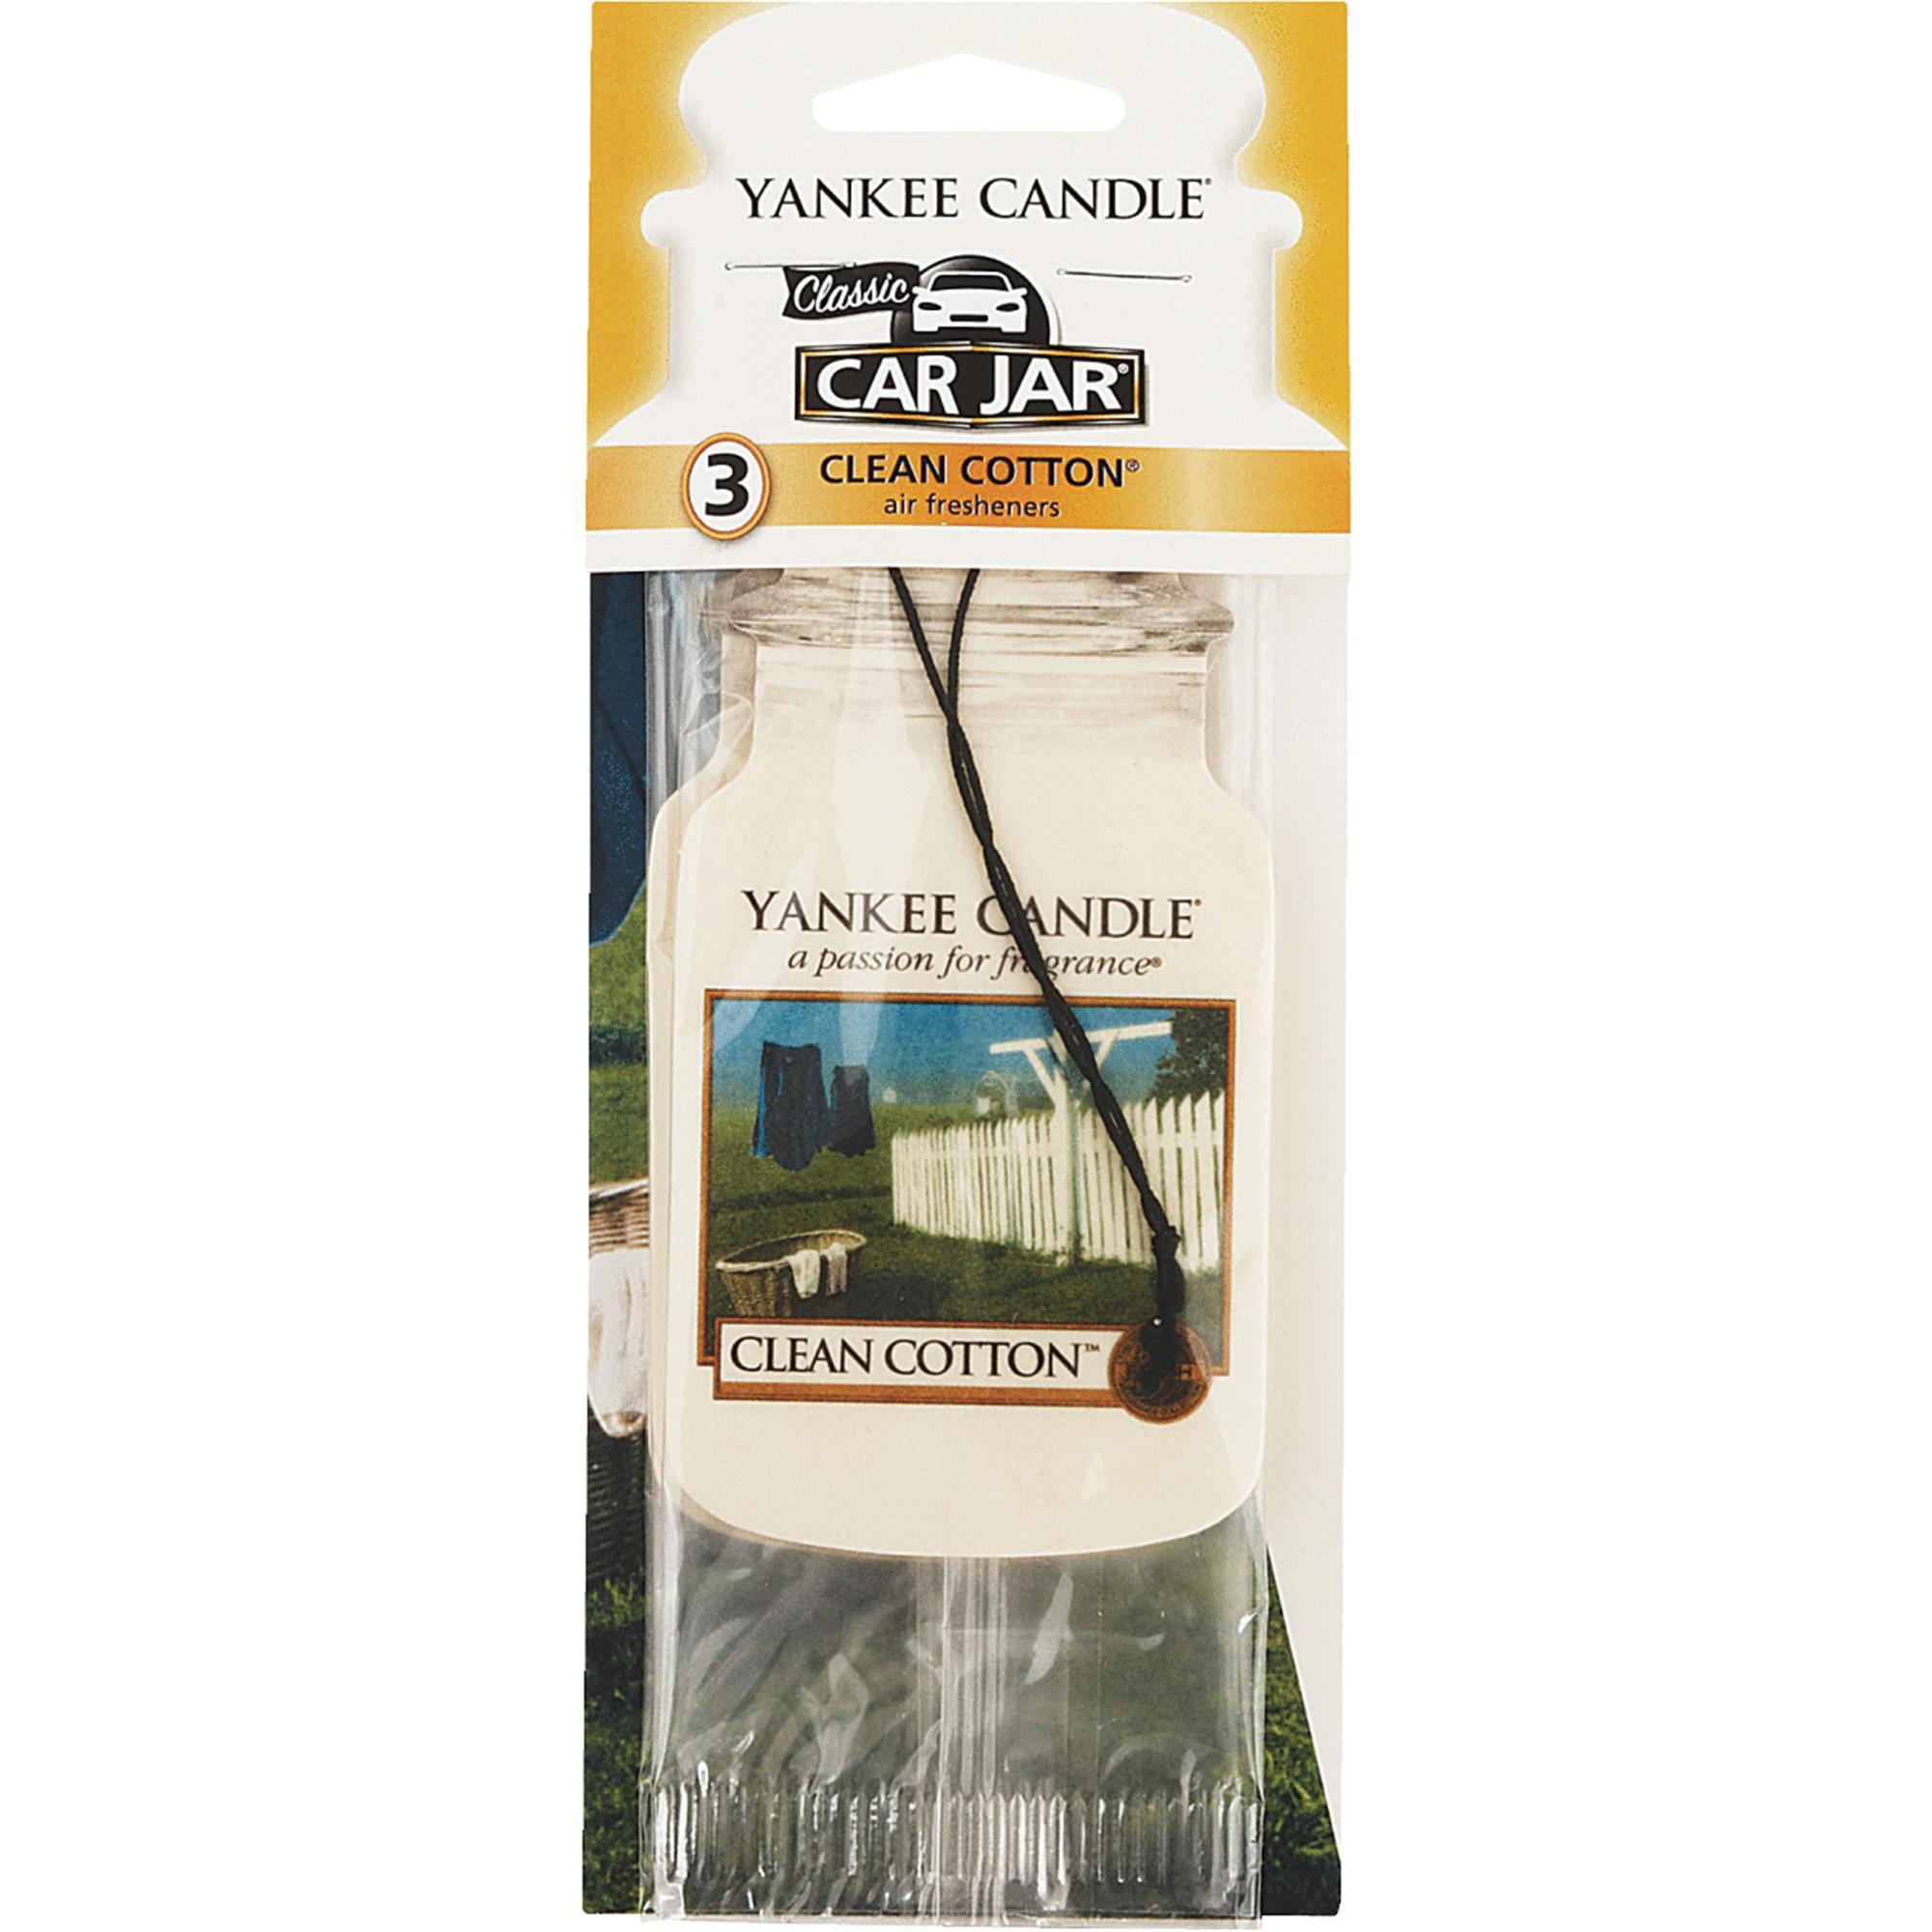 Yankee Candle Car Jar Classic Car Air Freshener